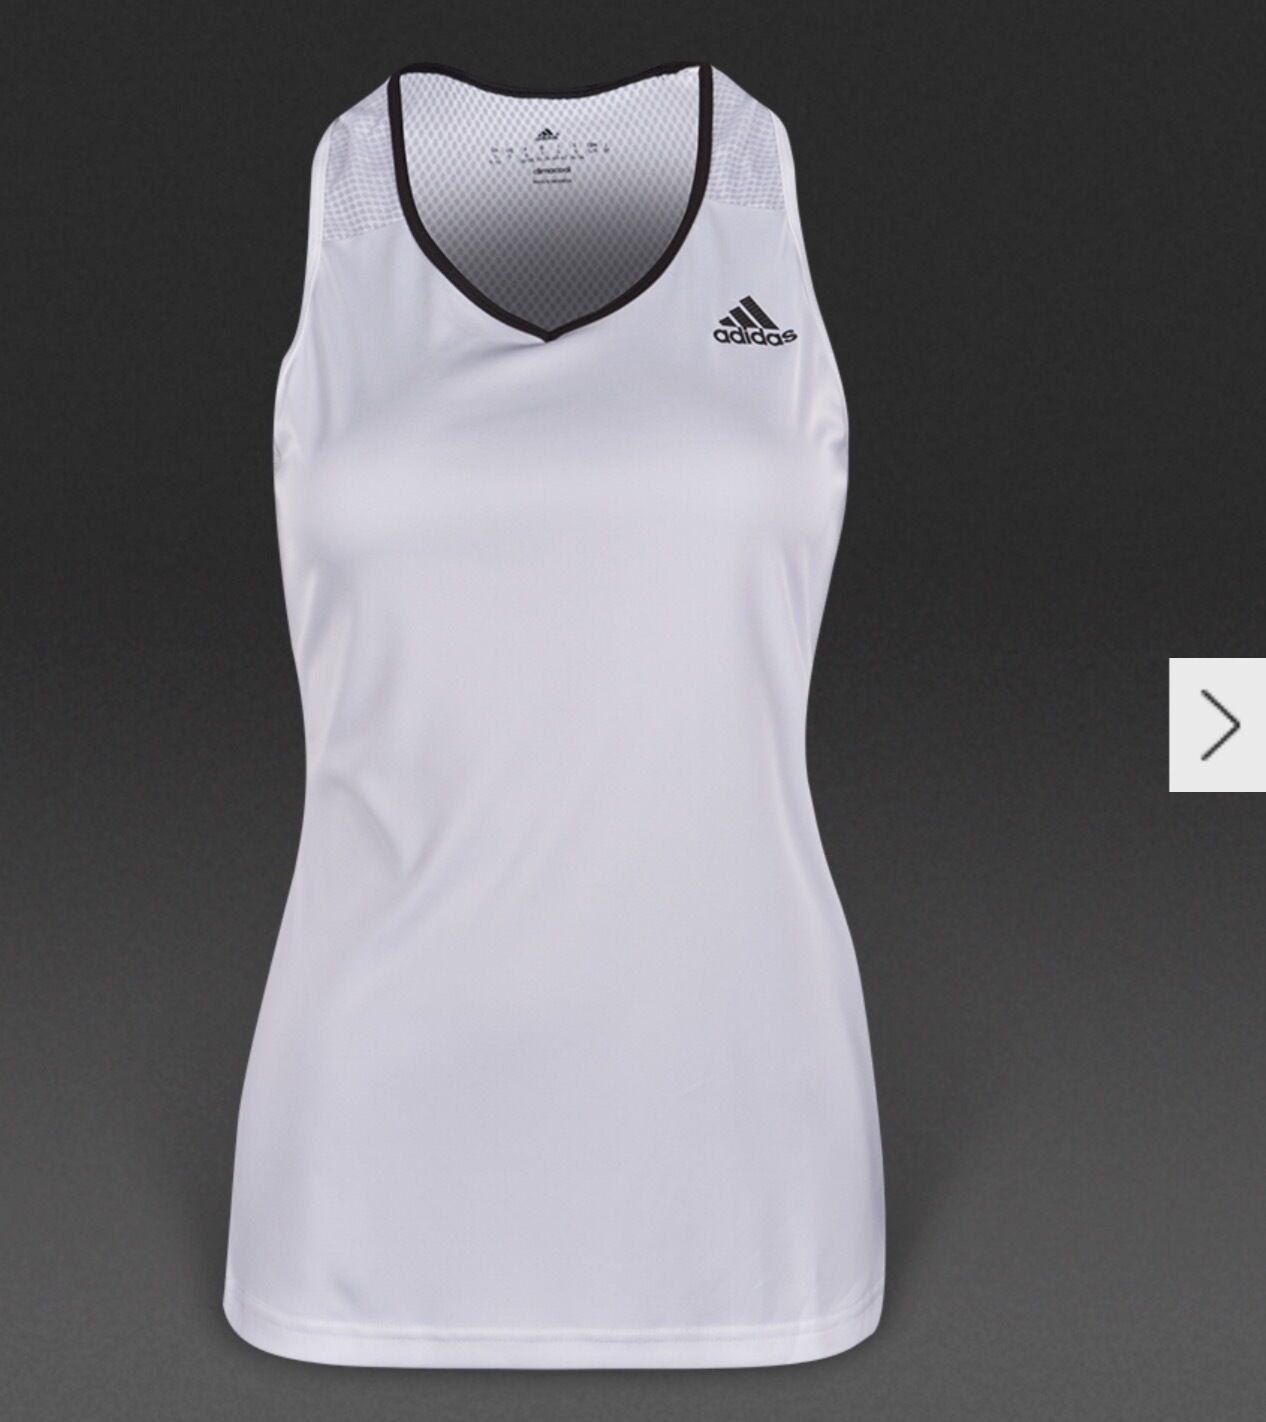 Adidas Womens Climalite Tennis Training Top exercise ladies large medium RRP